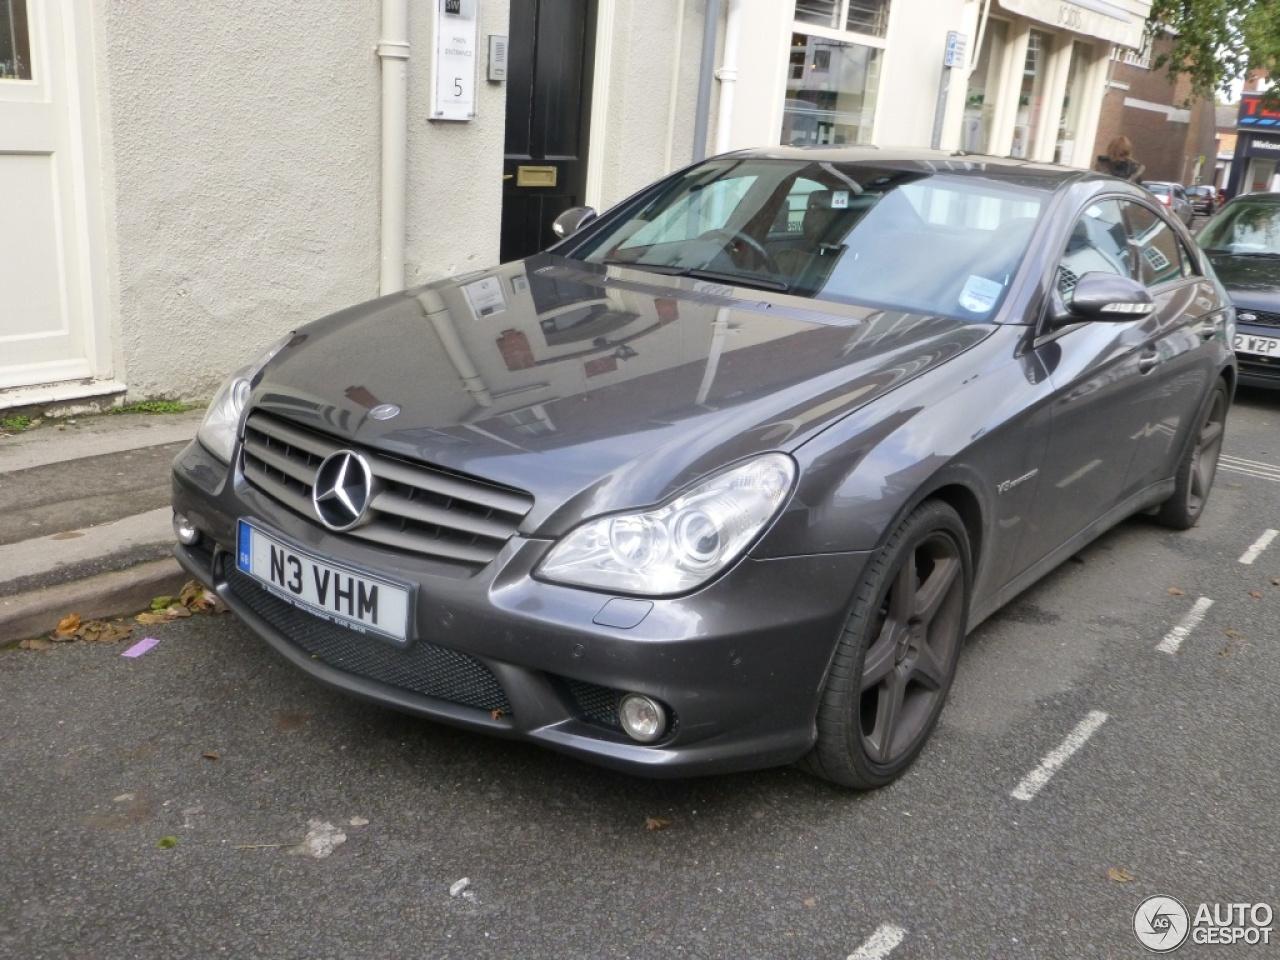 Mercedes benz cls 55 amg iwc ingenieur 17 november 2012 for Mercedes benz cls55 amg for sale